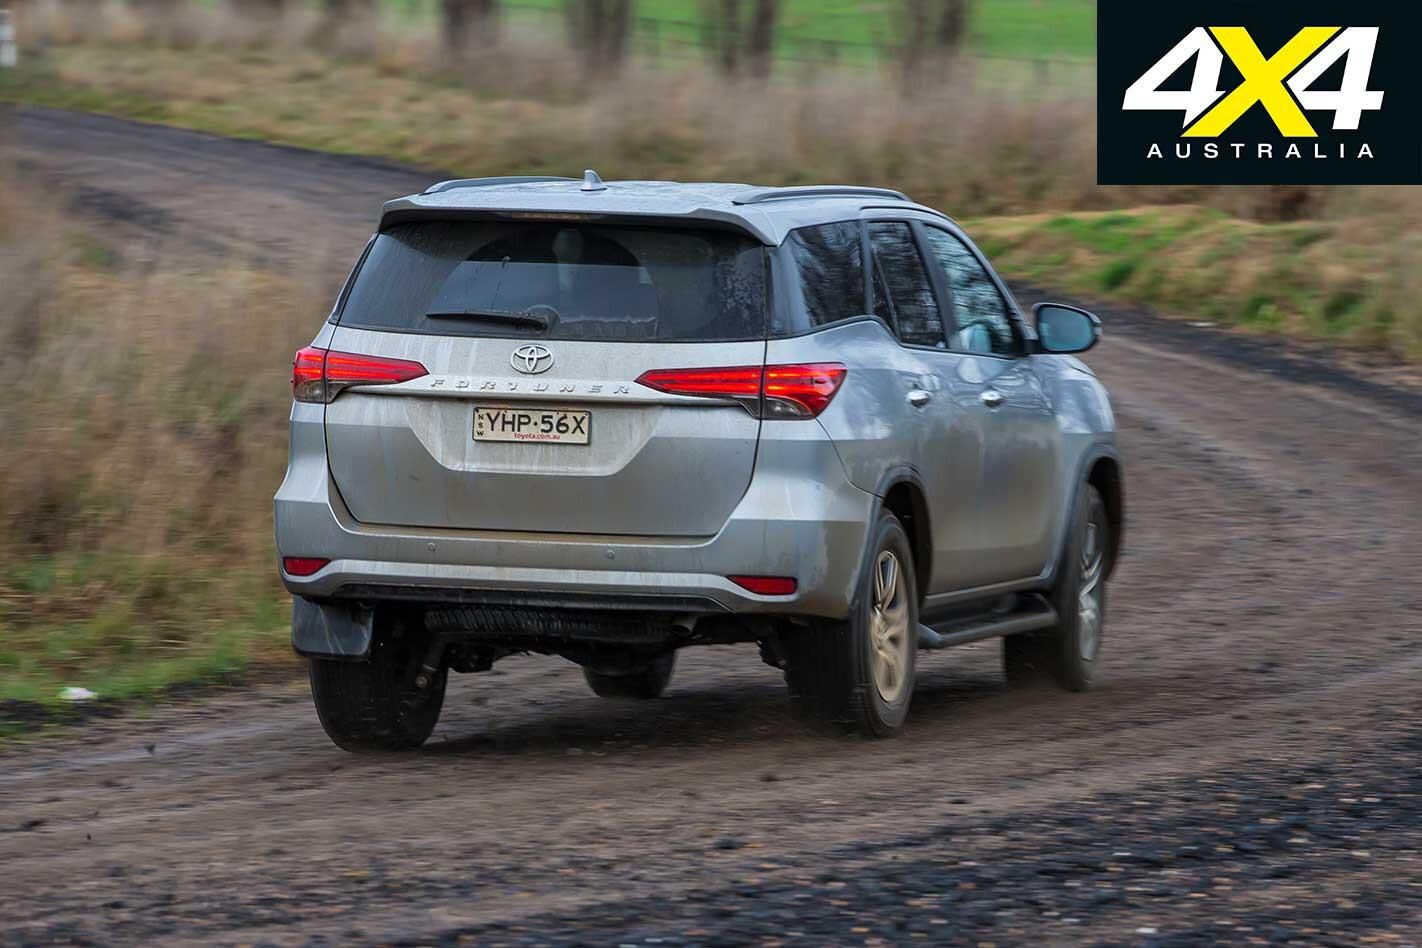 2018 Toyota Fortuner Rear Handling Jpg